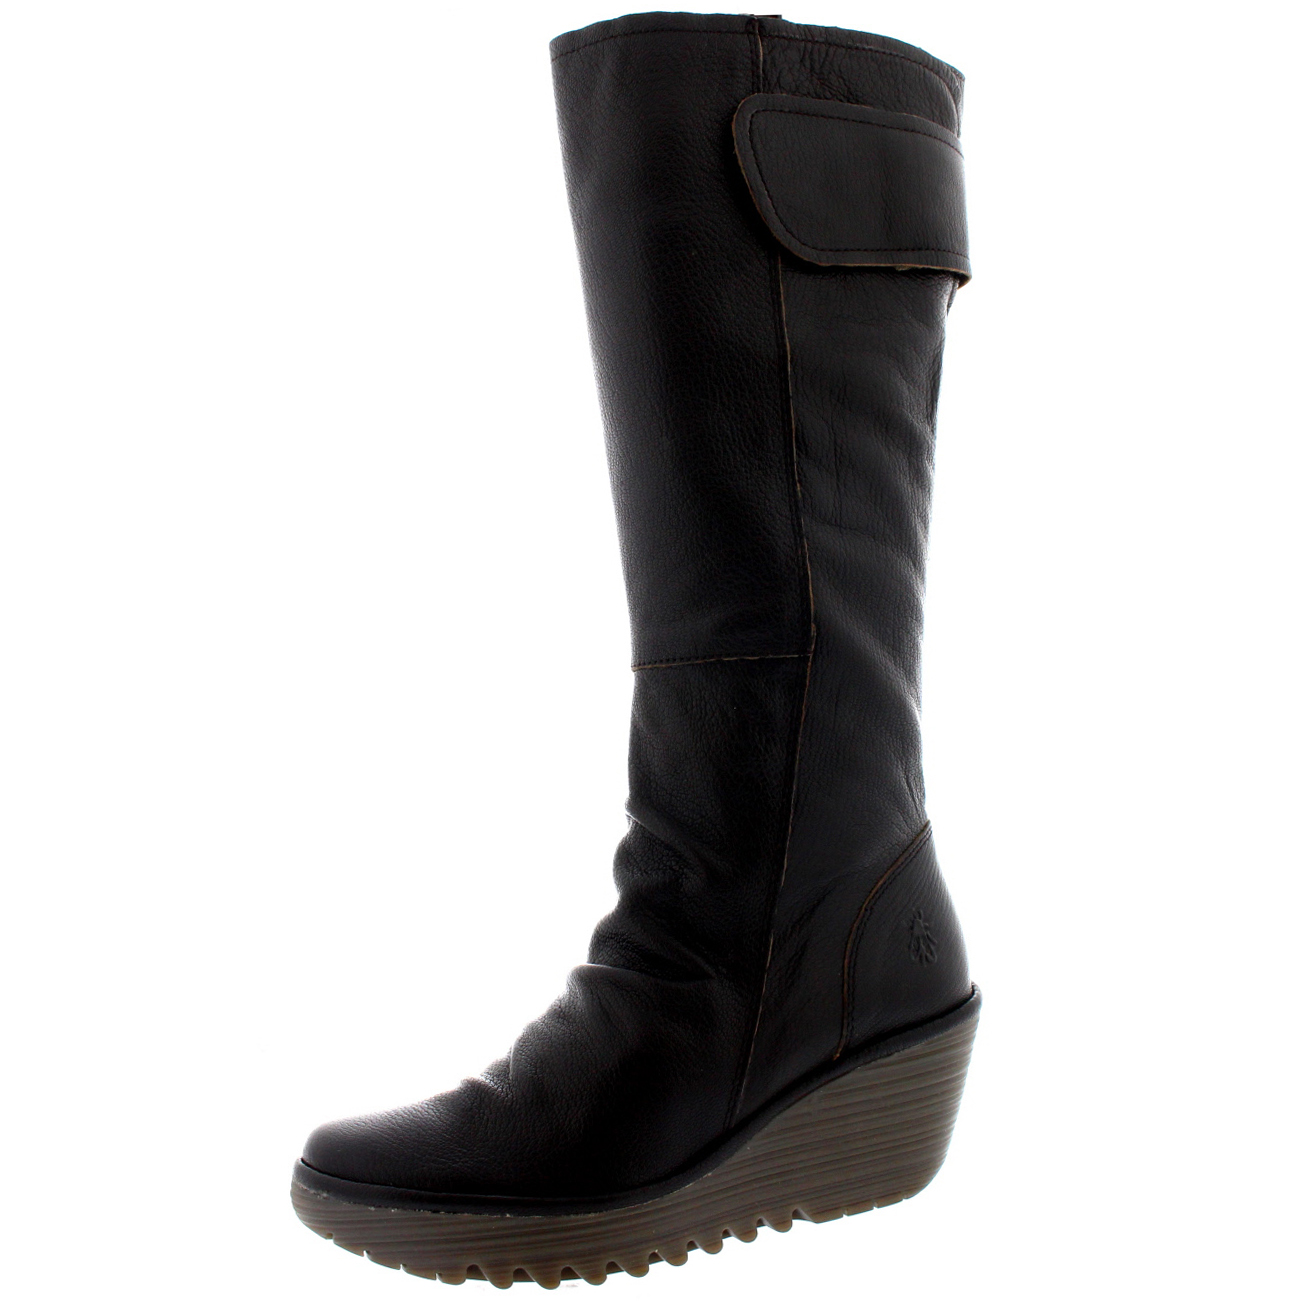 Boots Snow women size 12